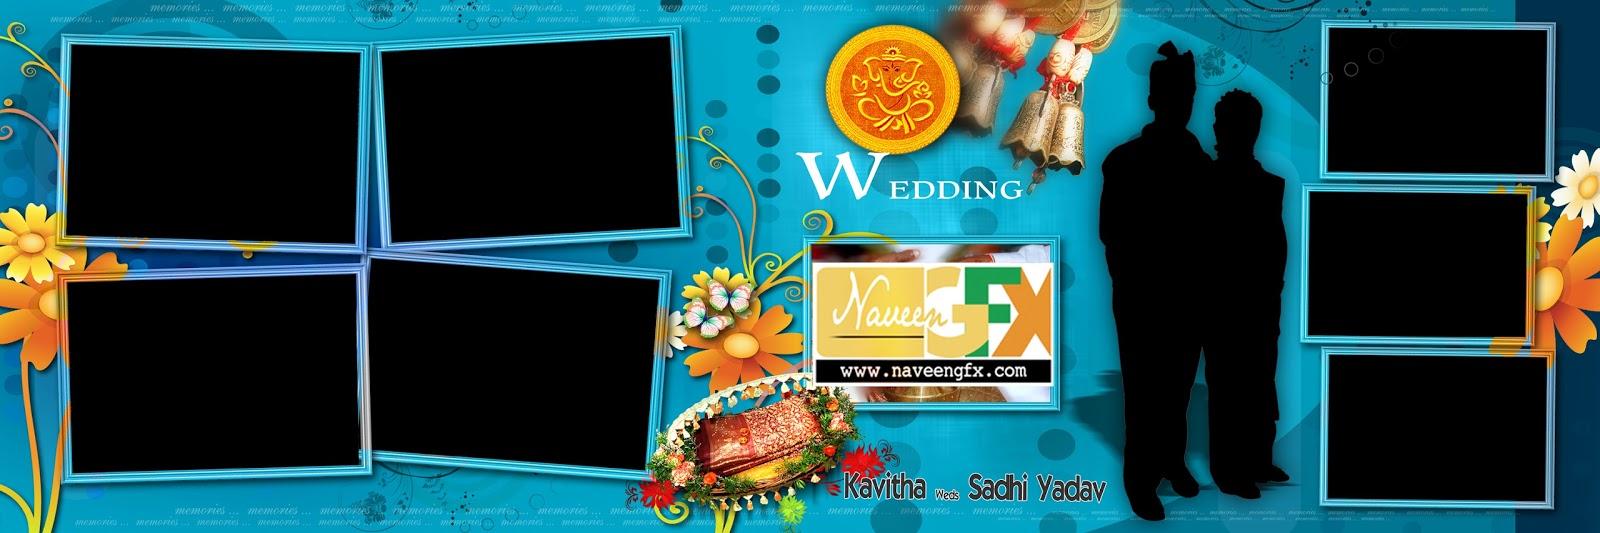 Indian Wedding 12x36 Album Photoshop Backgrounds Free Online Naveengfx